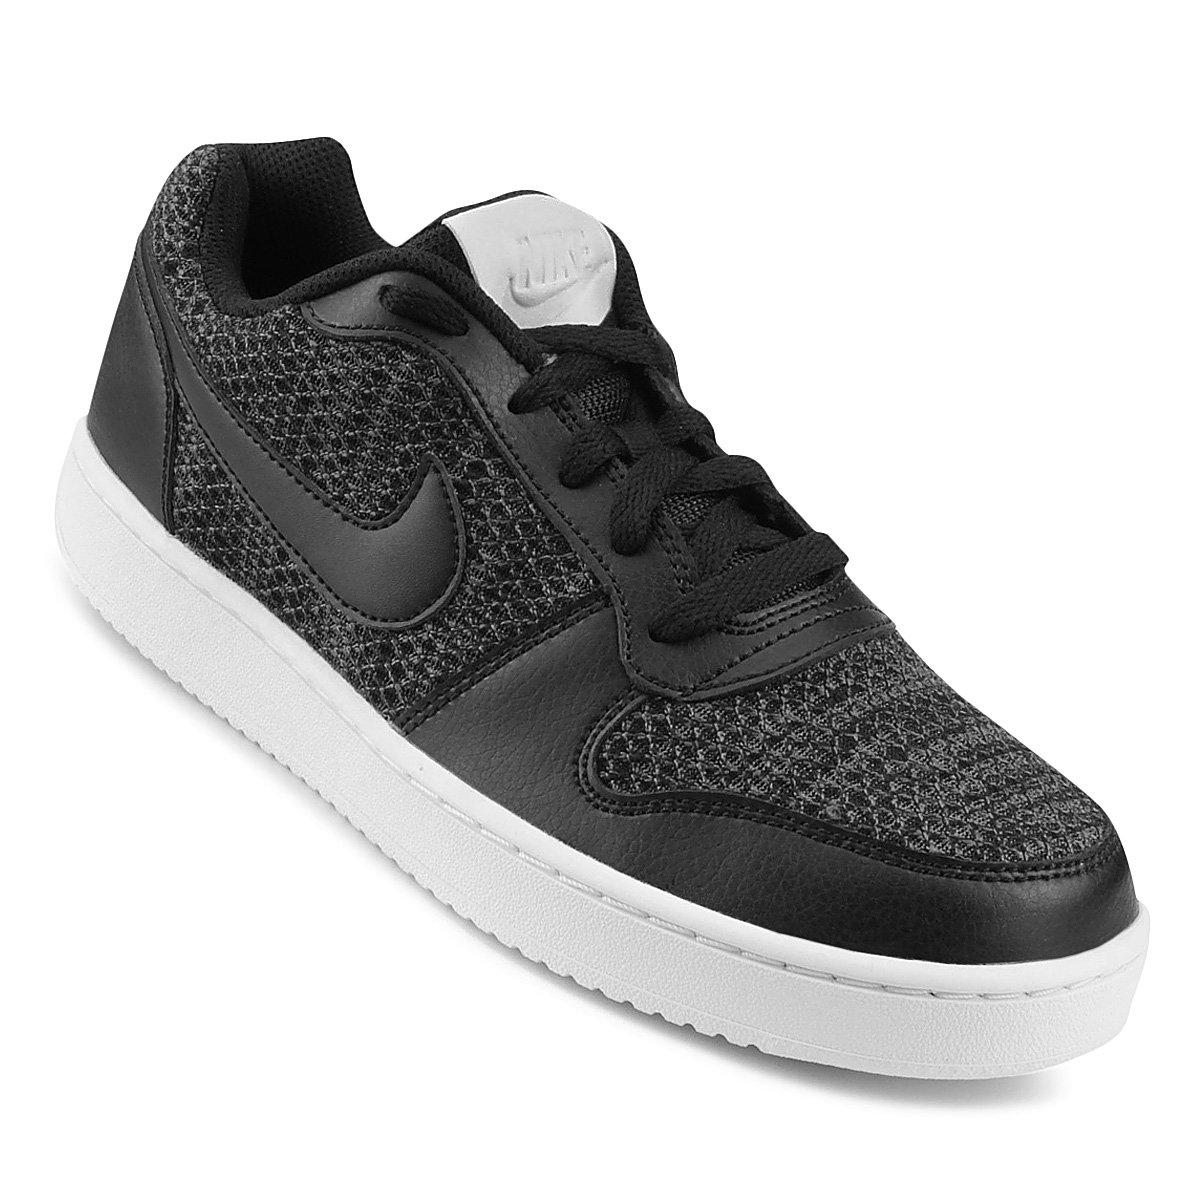 Tênis Nike Ebernon Low Prem Masculino Compre Compre Masculino Agora  Netsapatos 121628 98ccfc575c